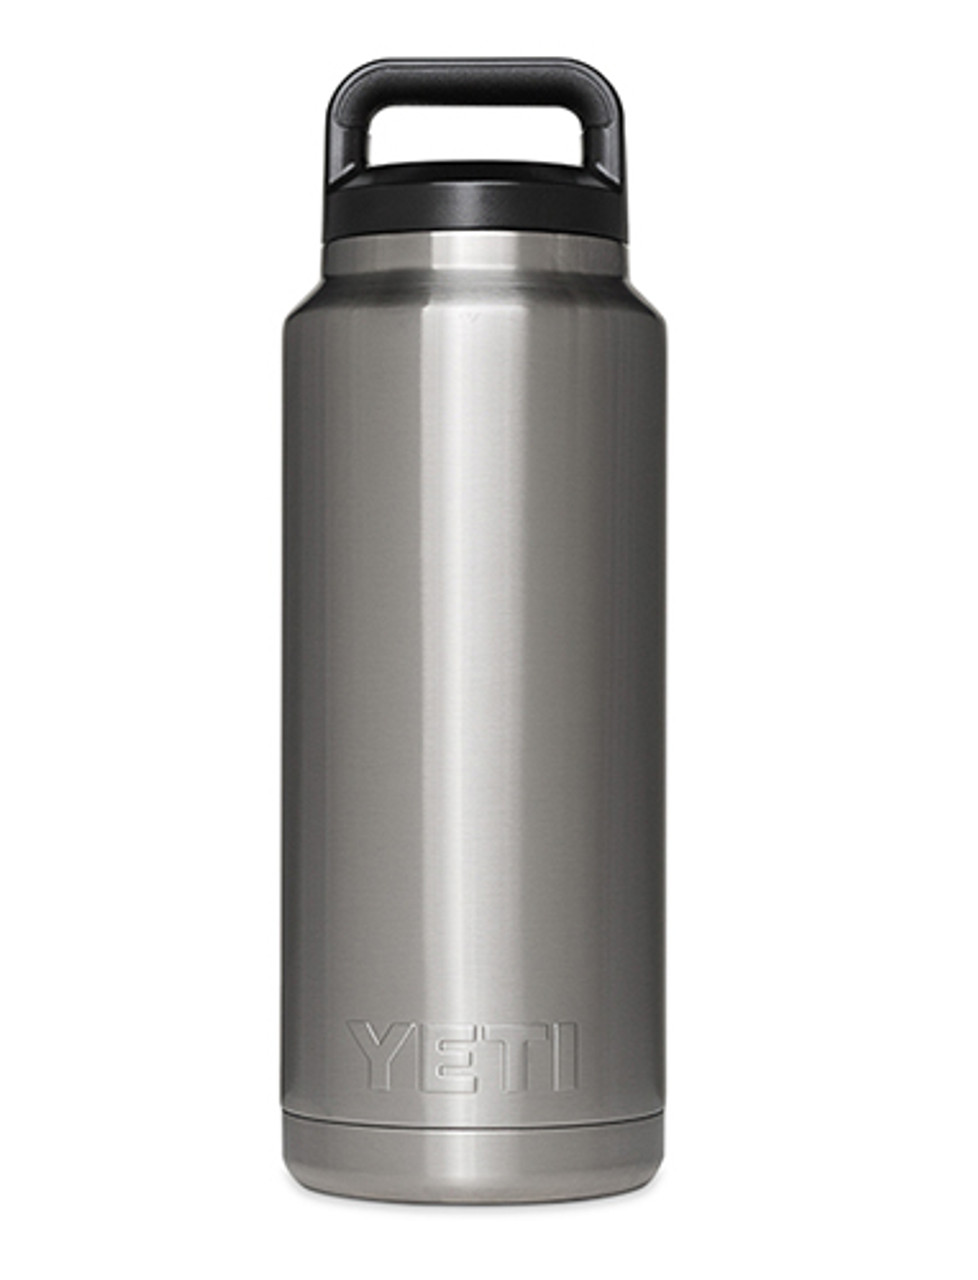 Yeti 36 oz Stainless Steel Double Wall Rambler Bottle